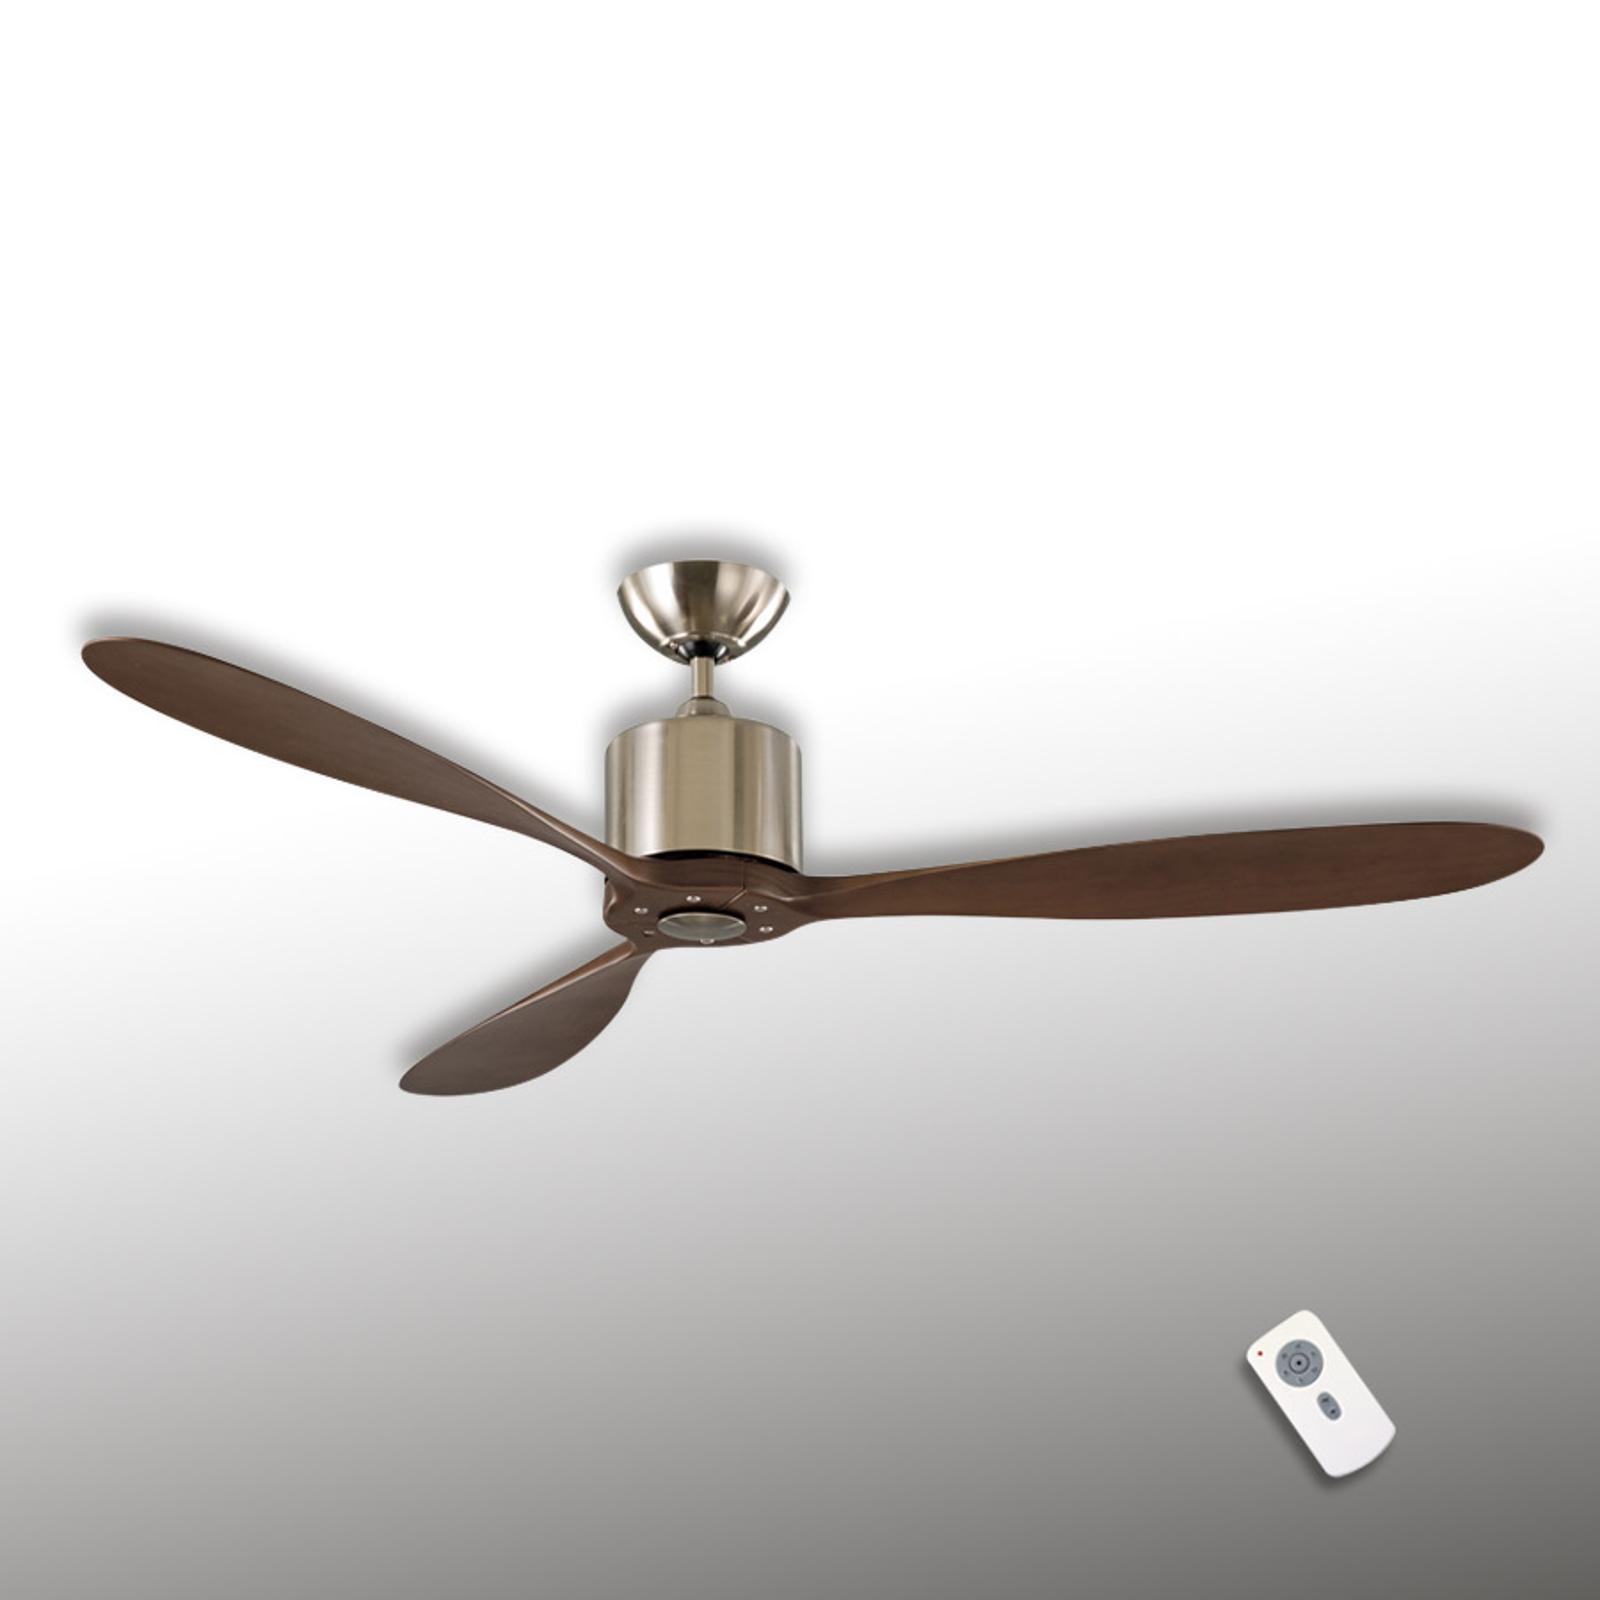 Aeroplan Eco -kattotuuletin, kromi, pähkinäpuu